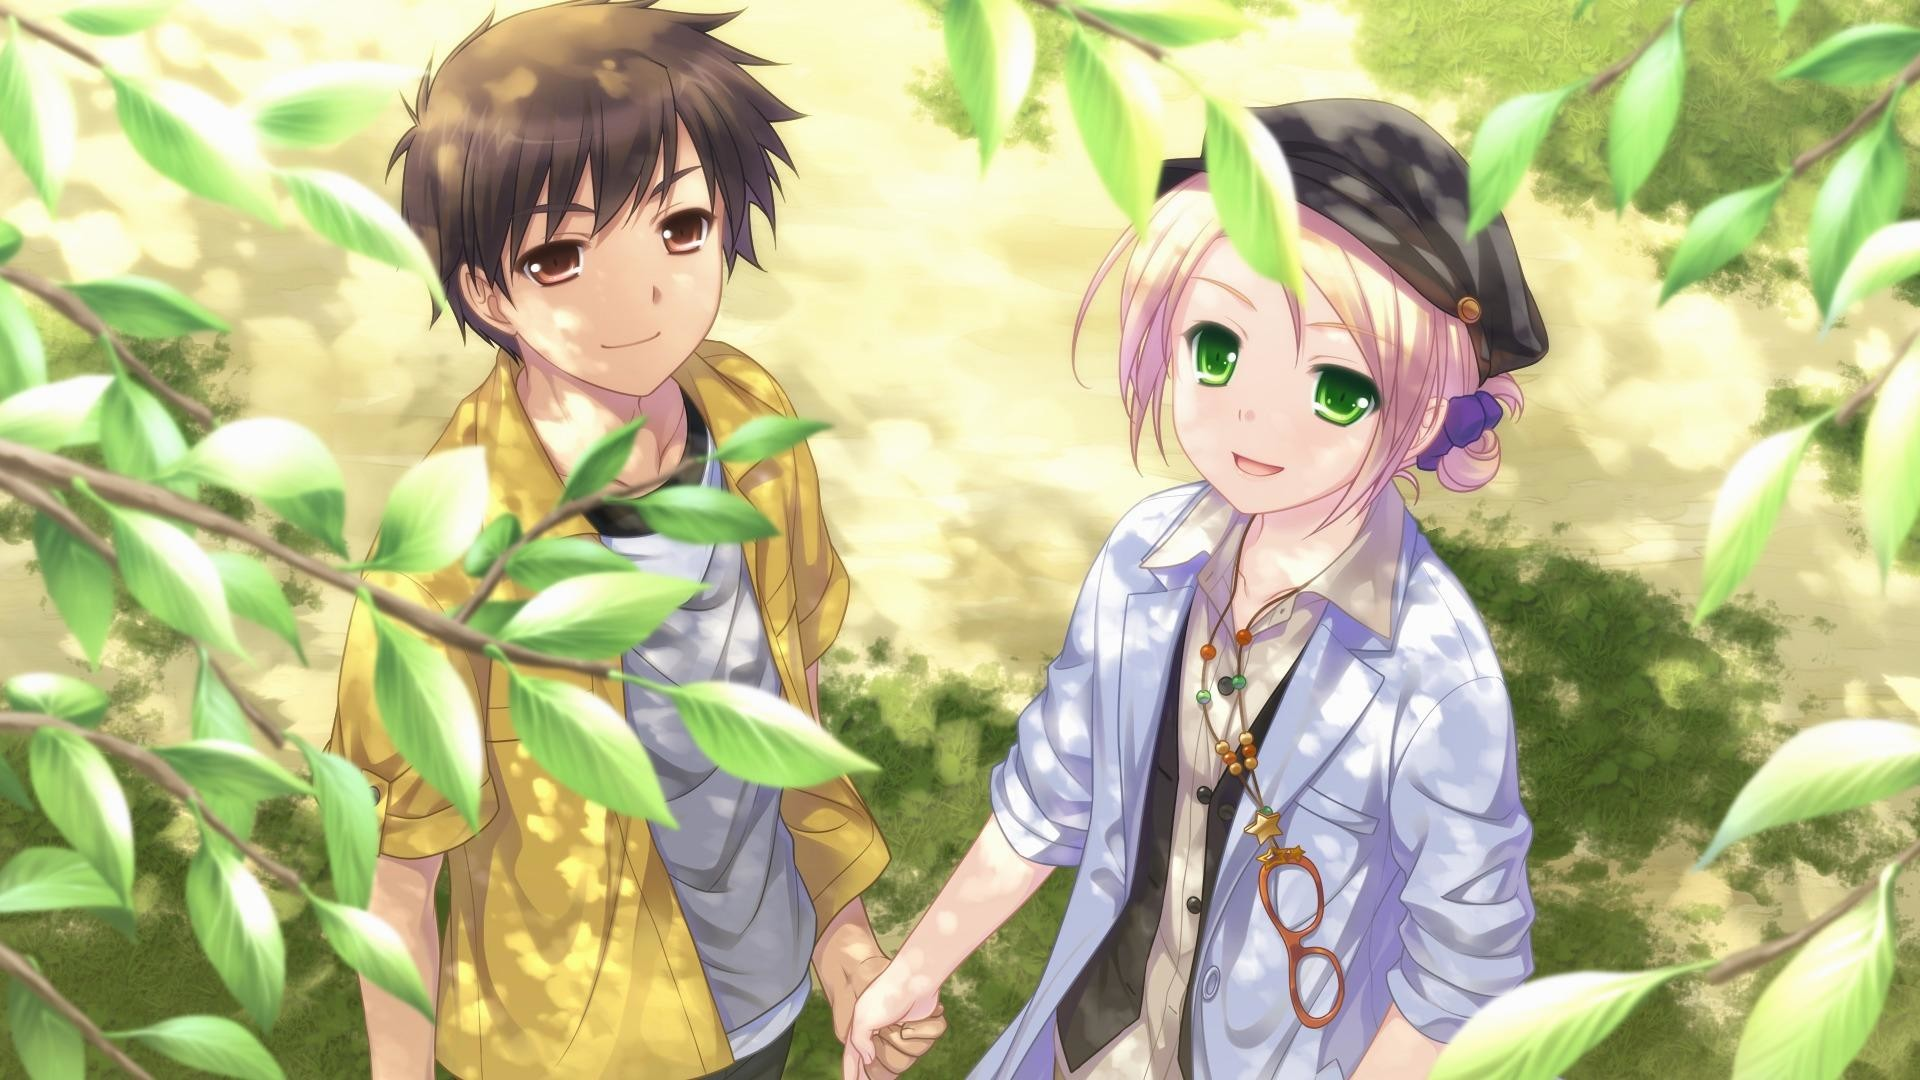 wallpaper.wiki-Free-Download-Cute-Anime-Couple-Wallpaper-